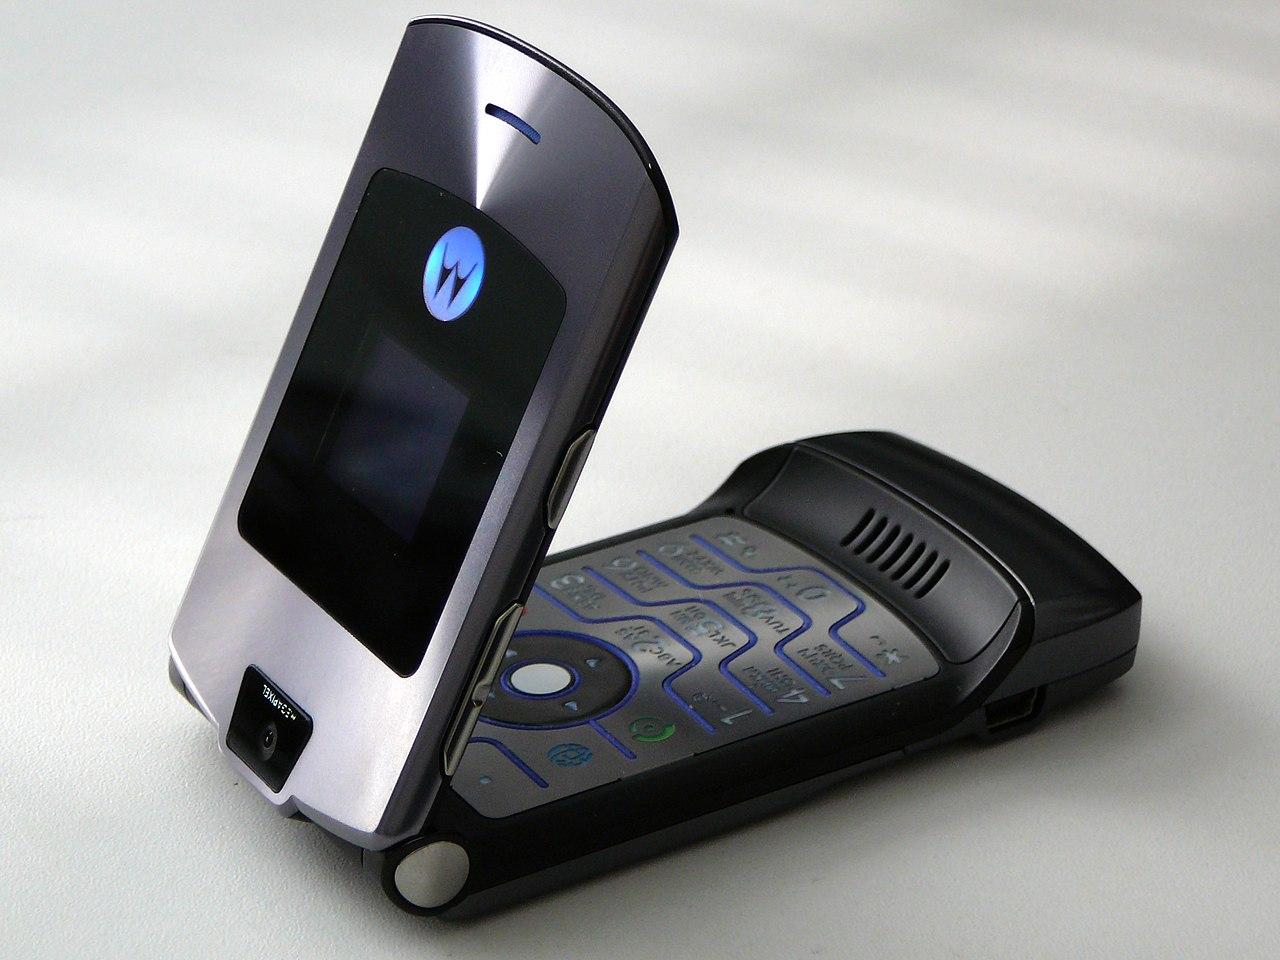 File:Motorola RAZR V3i 03.JPG